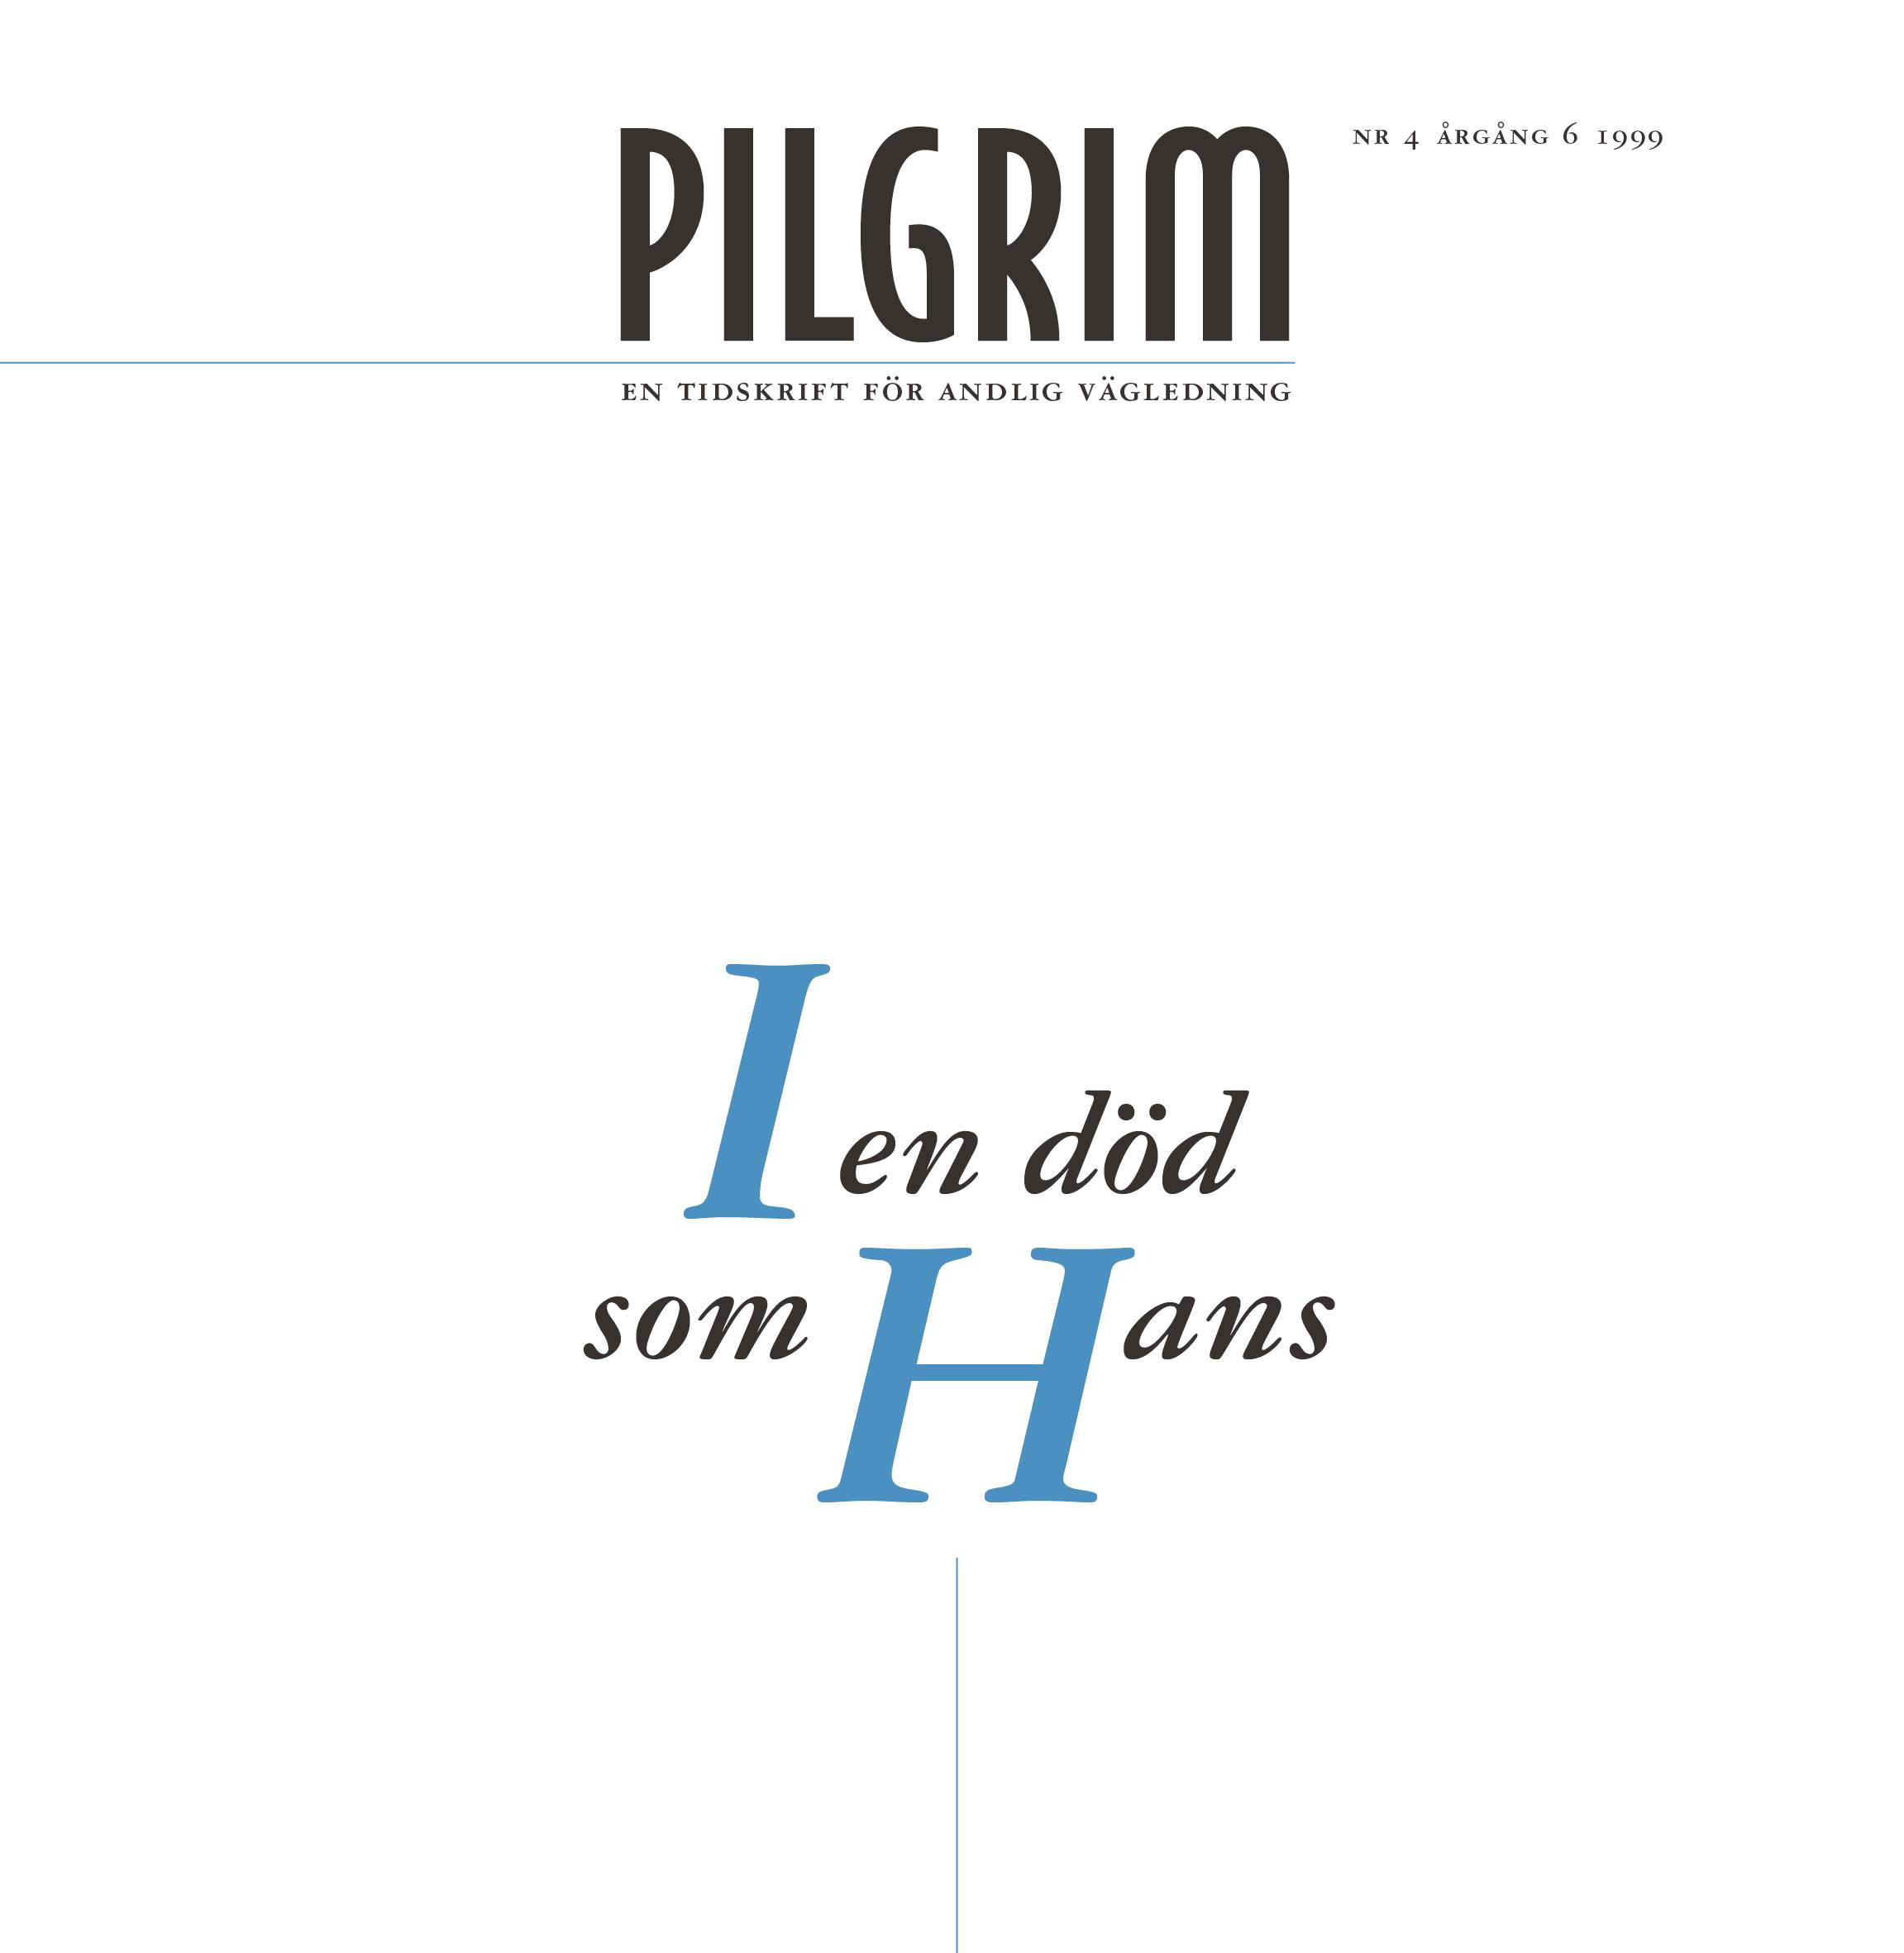 Pilgrim frams 1999-4